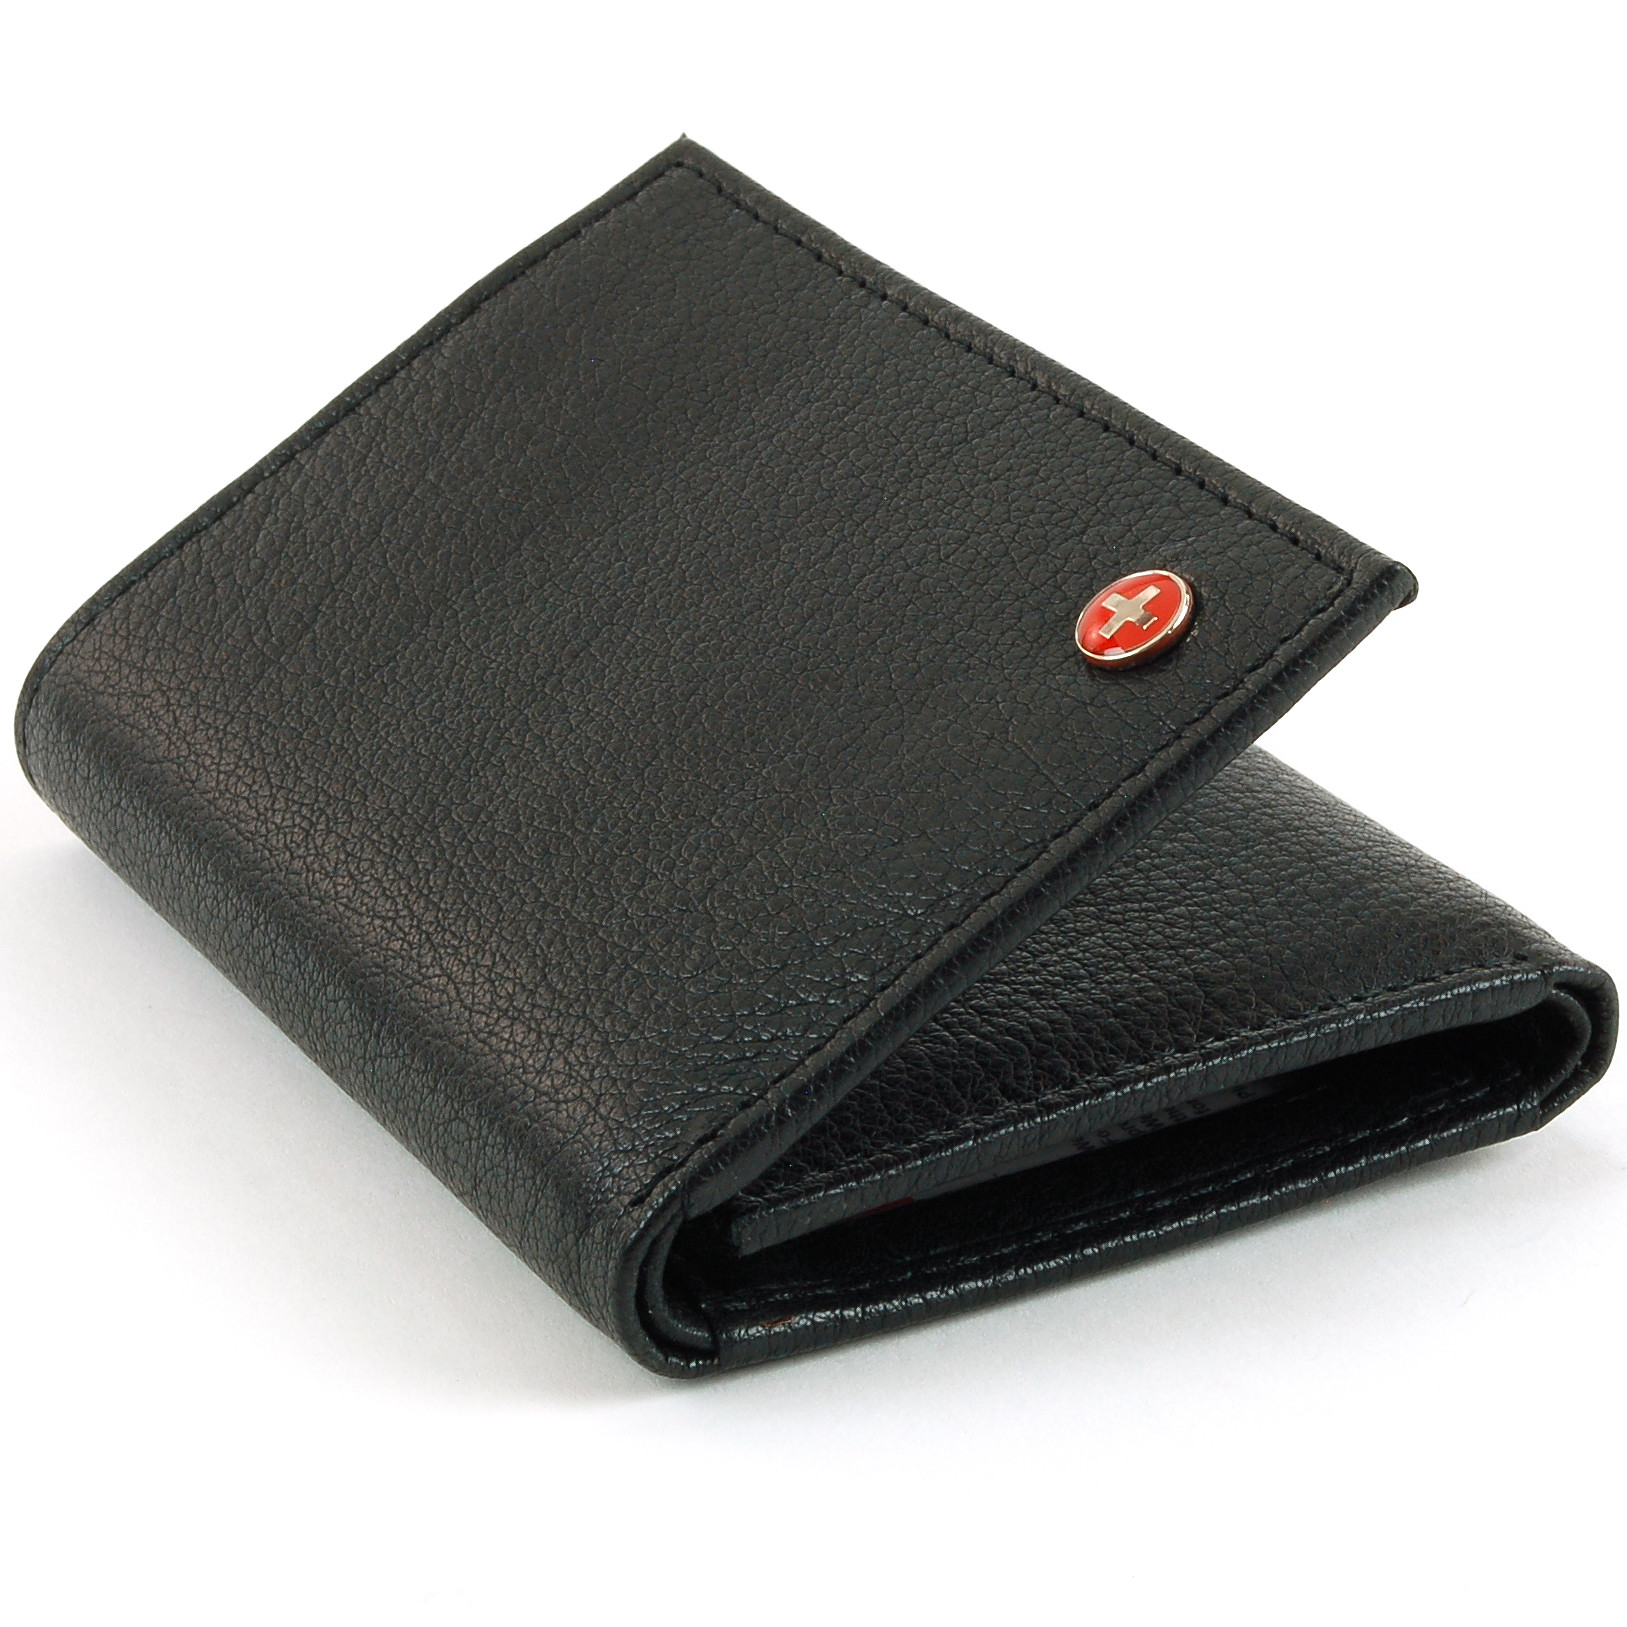 Alpine Swiss RFID Blocking Mens Trifold Wallet Leather ID Bill Holder Card Case